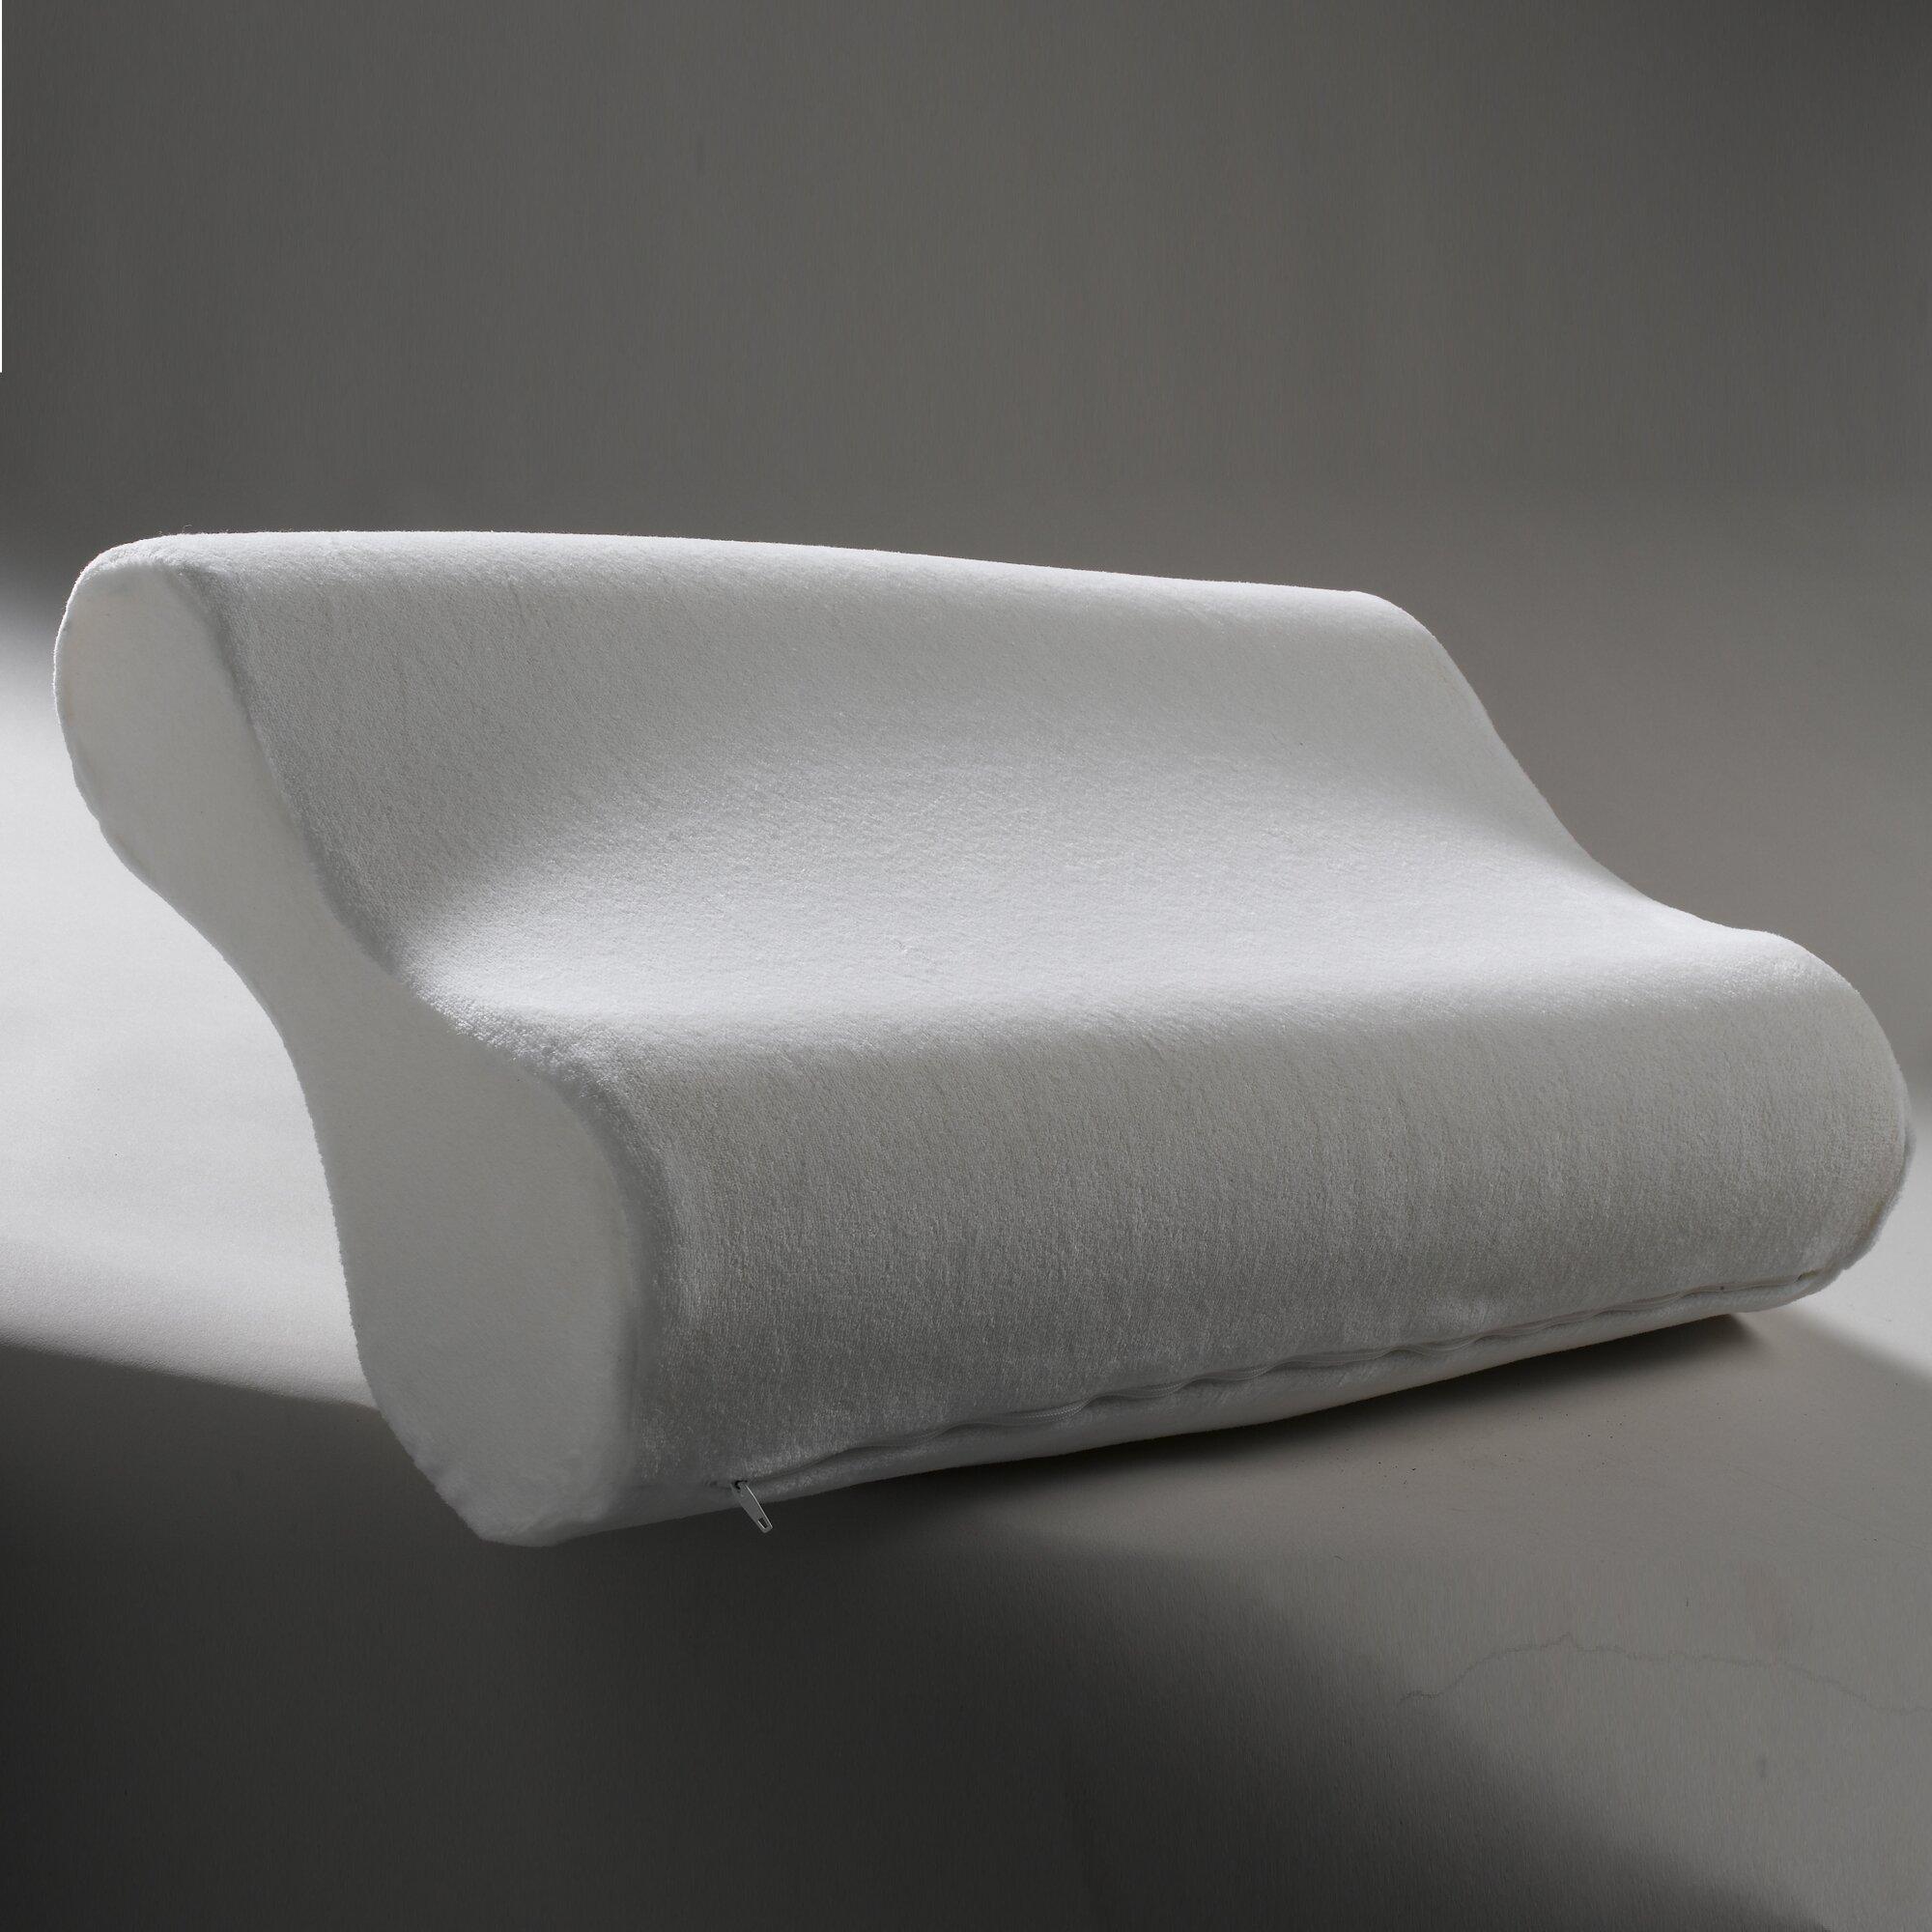 simmons beautyrest anti snore contour memory foam standard. Black Bedroom Furniture Sets. Home Design Ideas